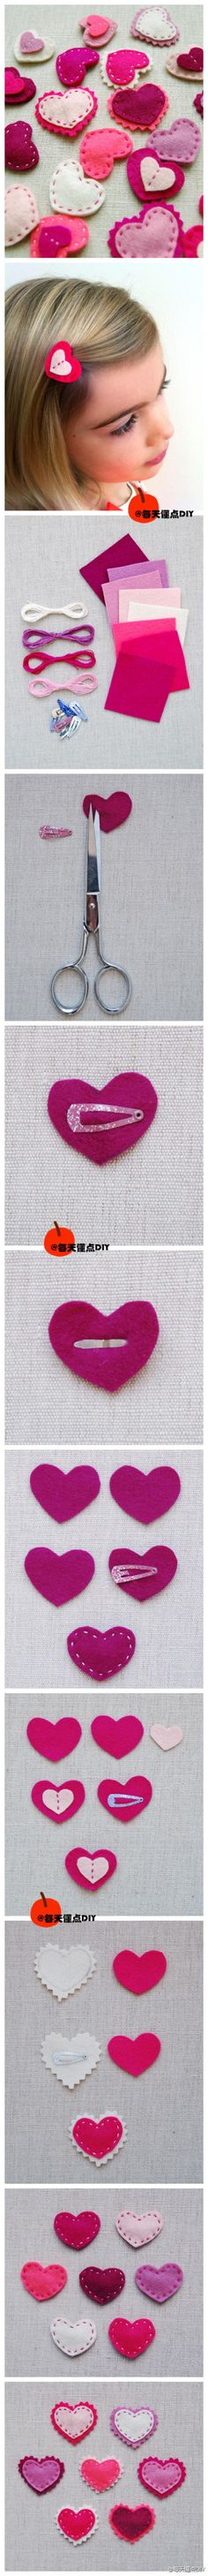 Felt heart hair clips - cute photo tutorial for easy clips - linked to Spanish Pinterest